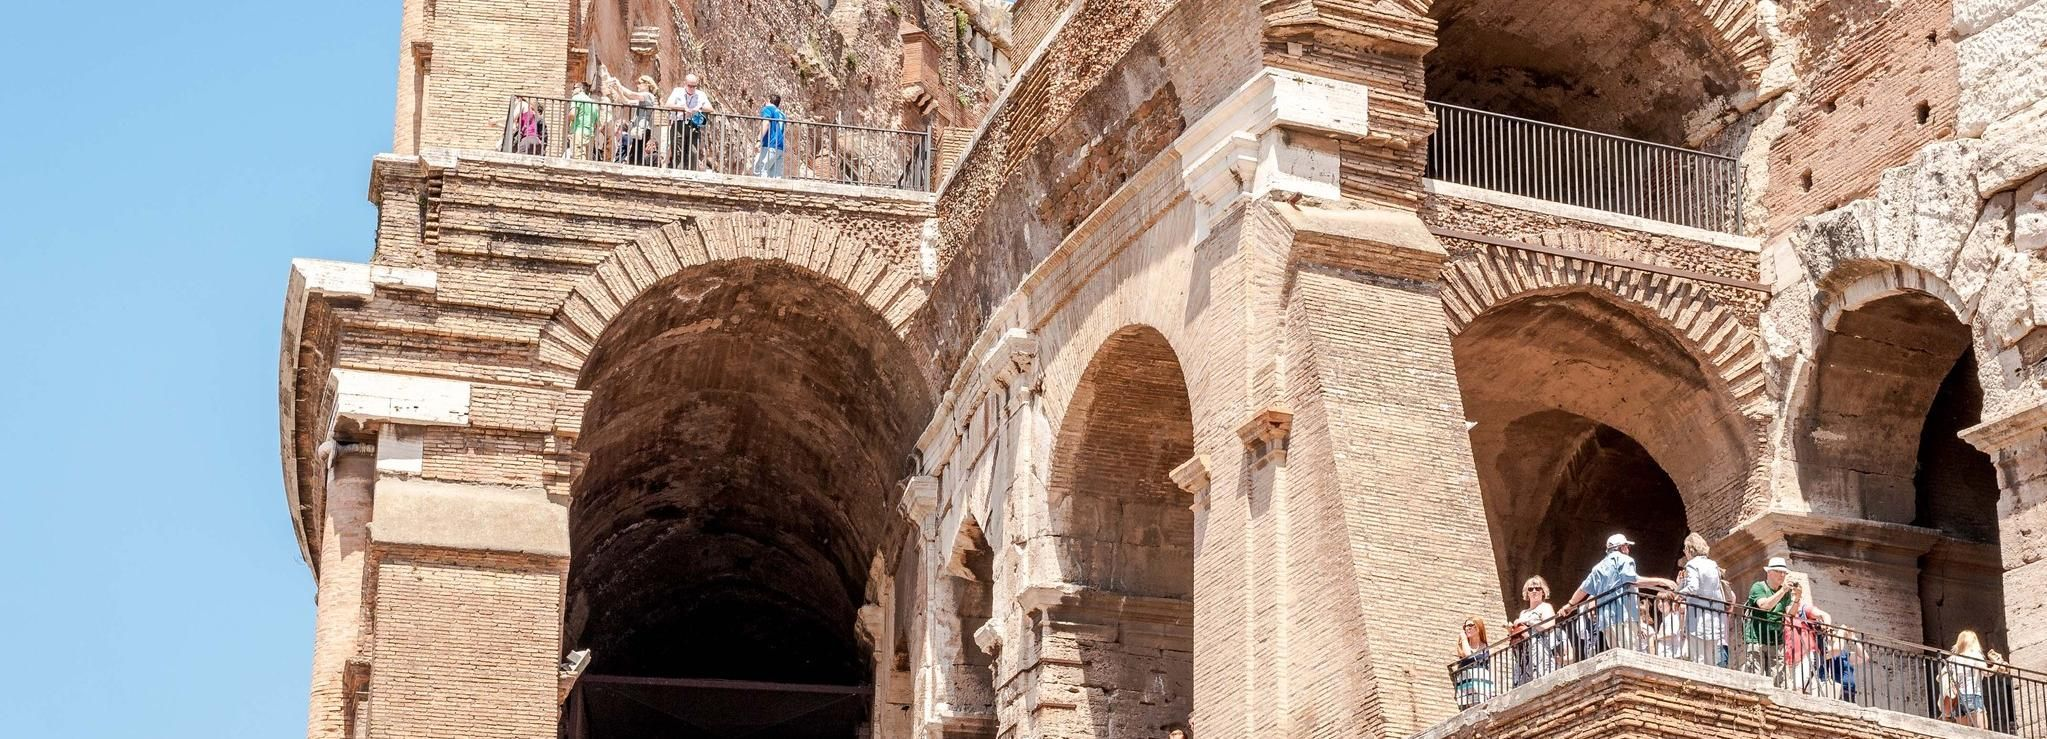 Rom: Kolosseum, Forum Romanum & Navona-Tour ohne Anstehen